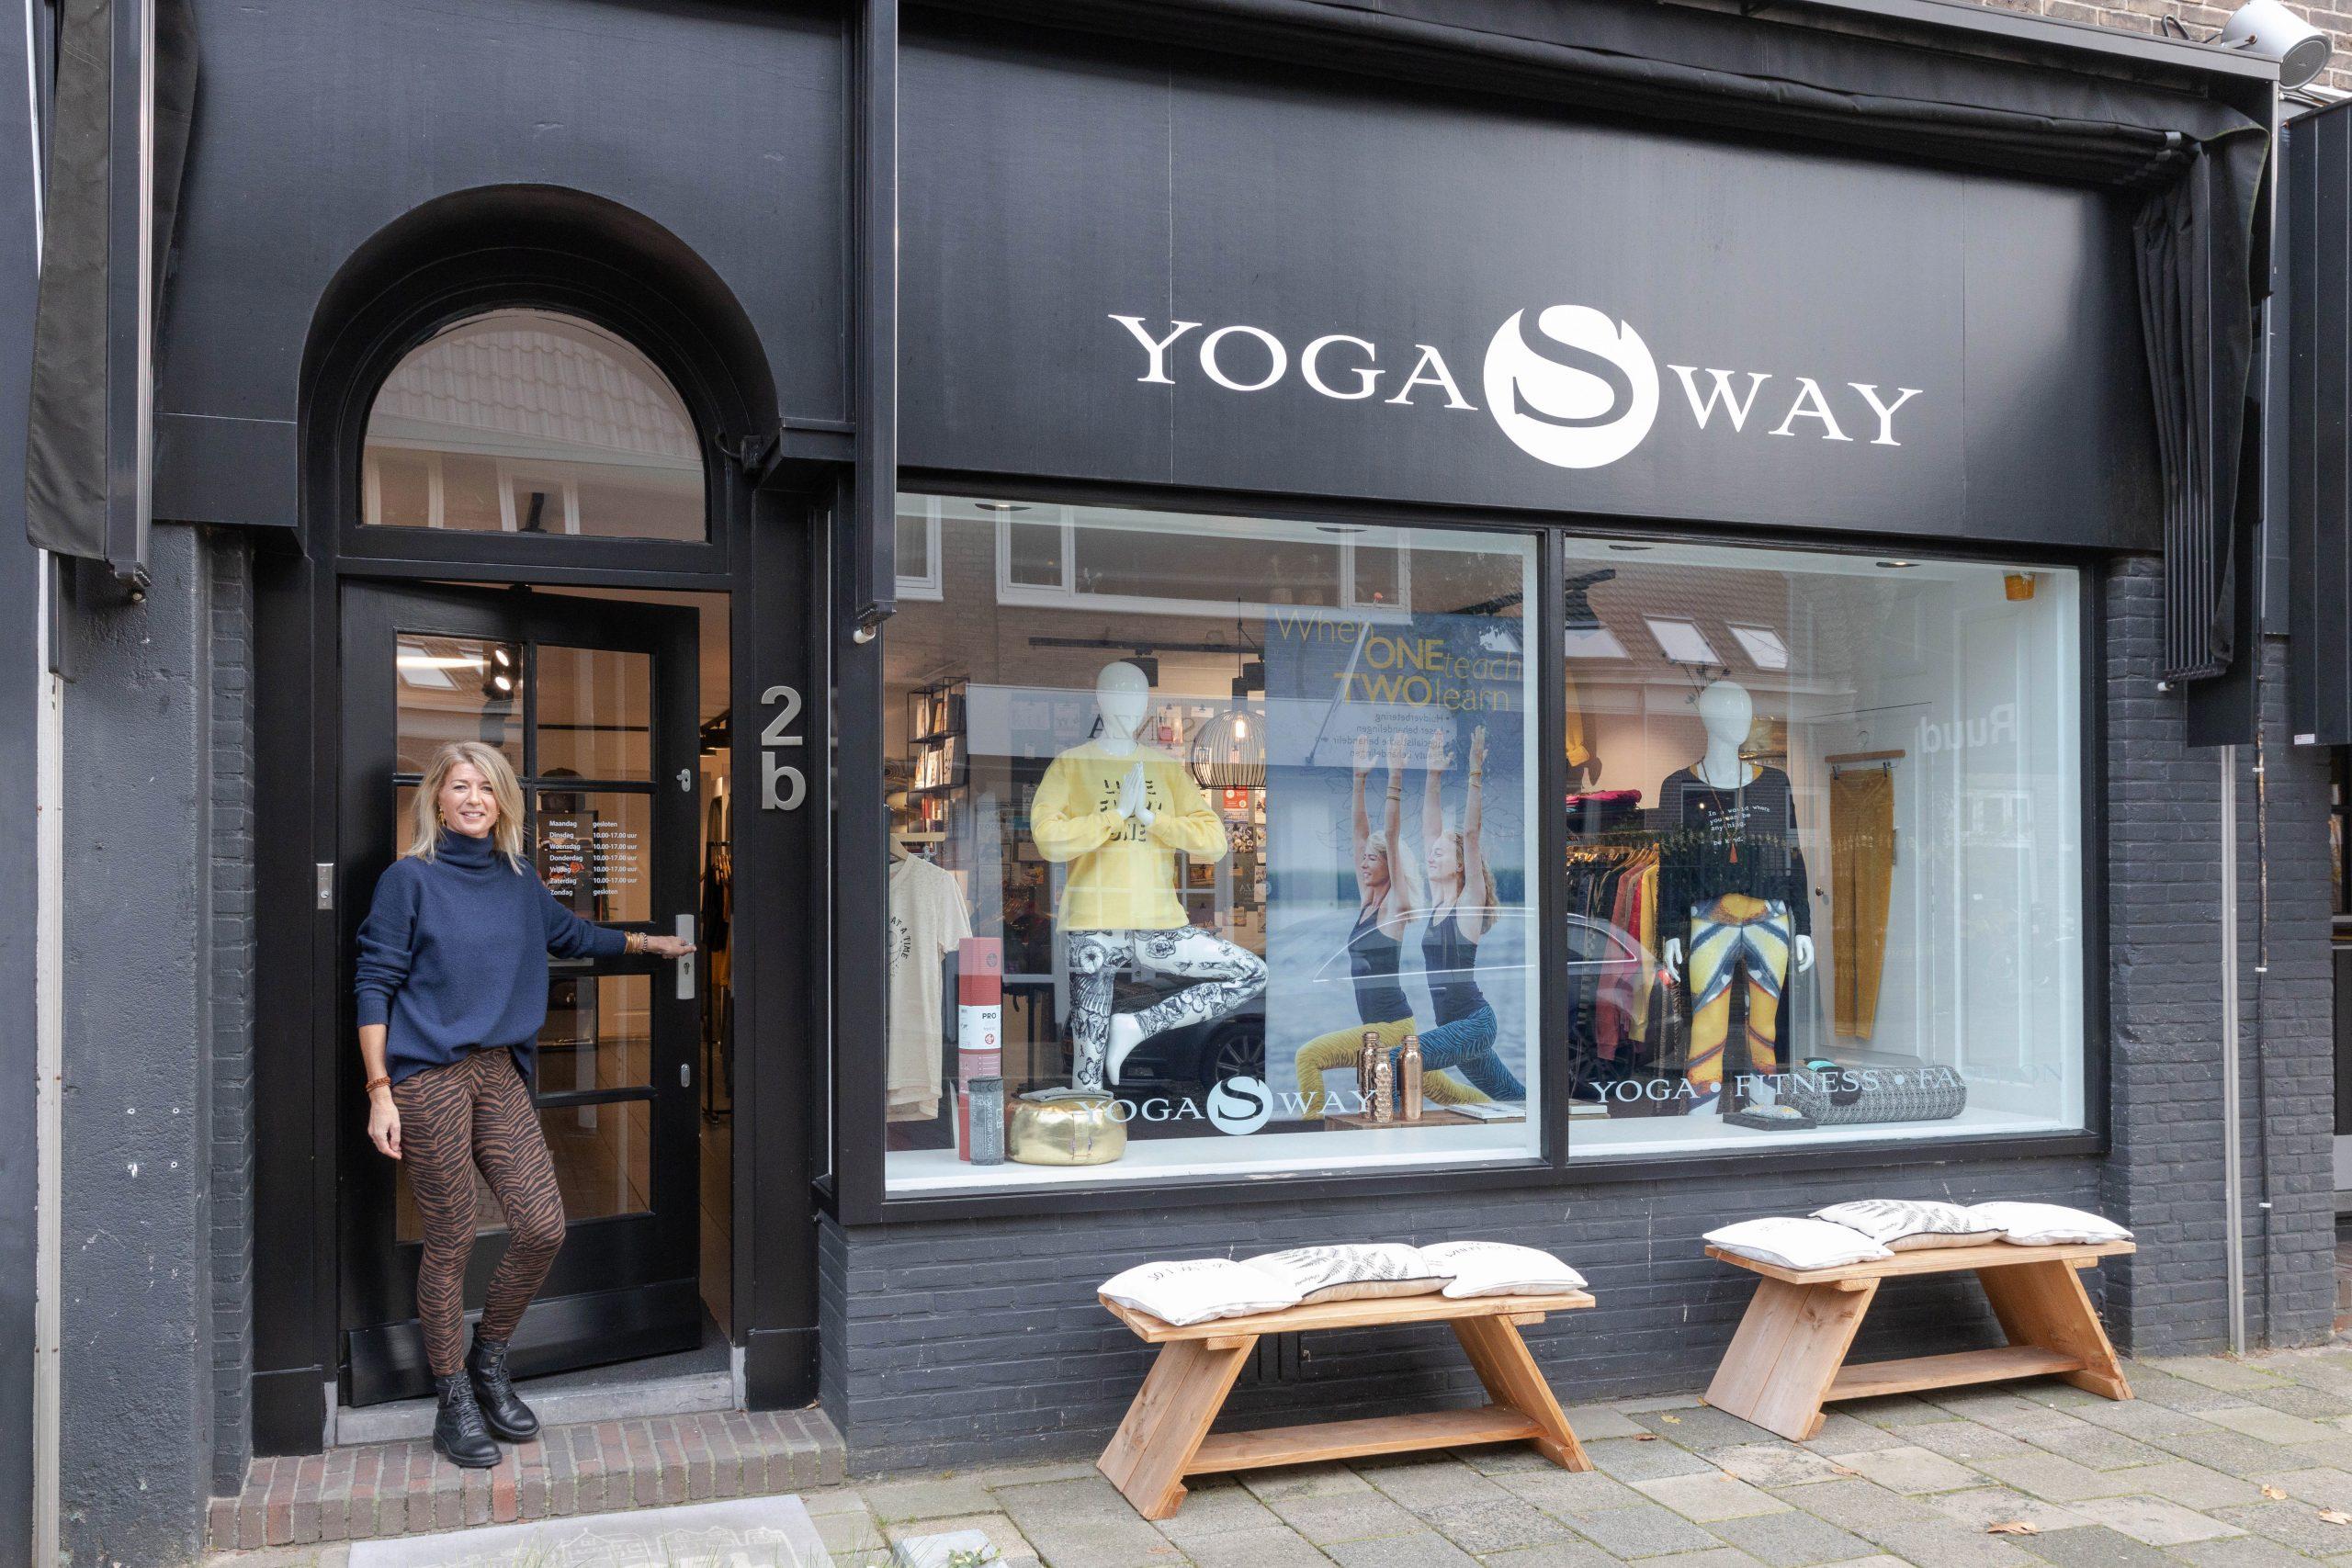 YogaSway